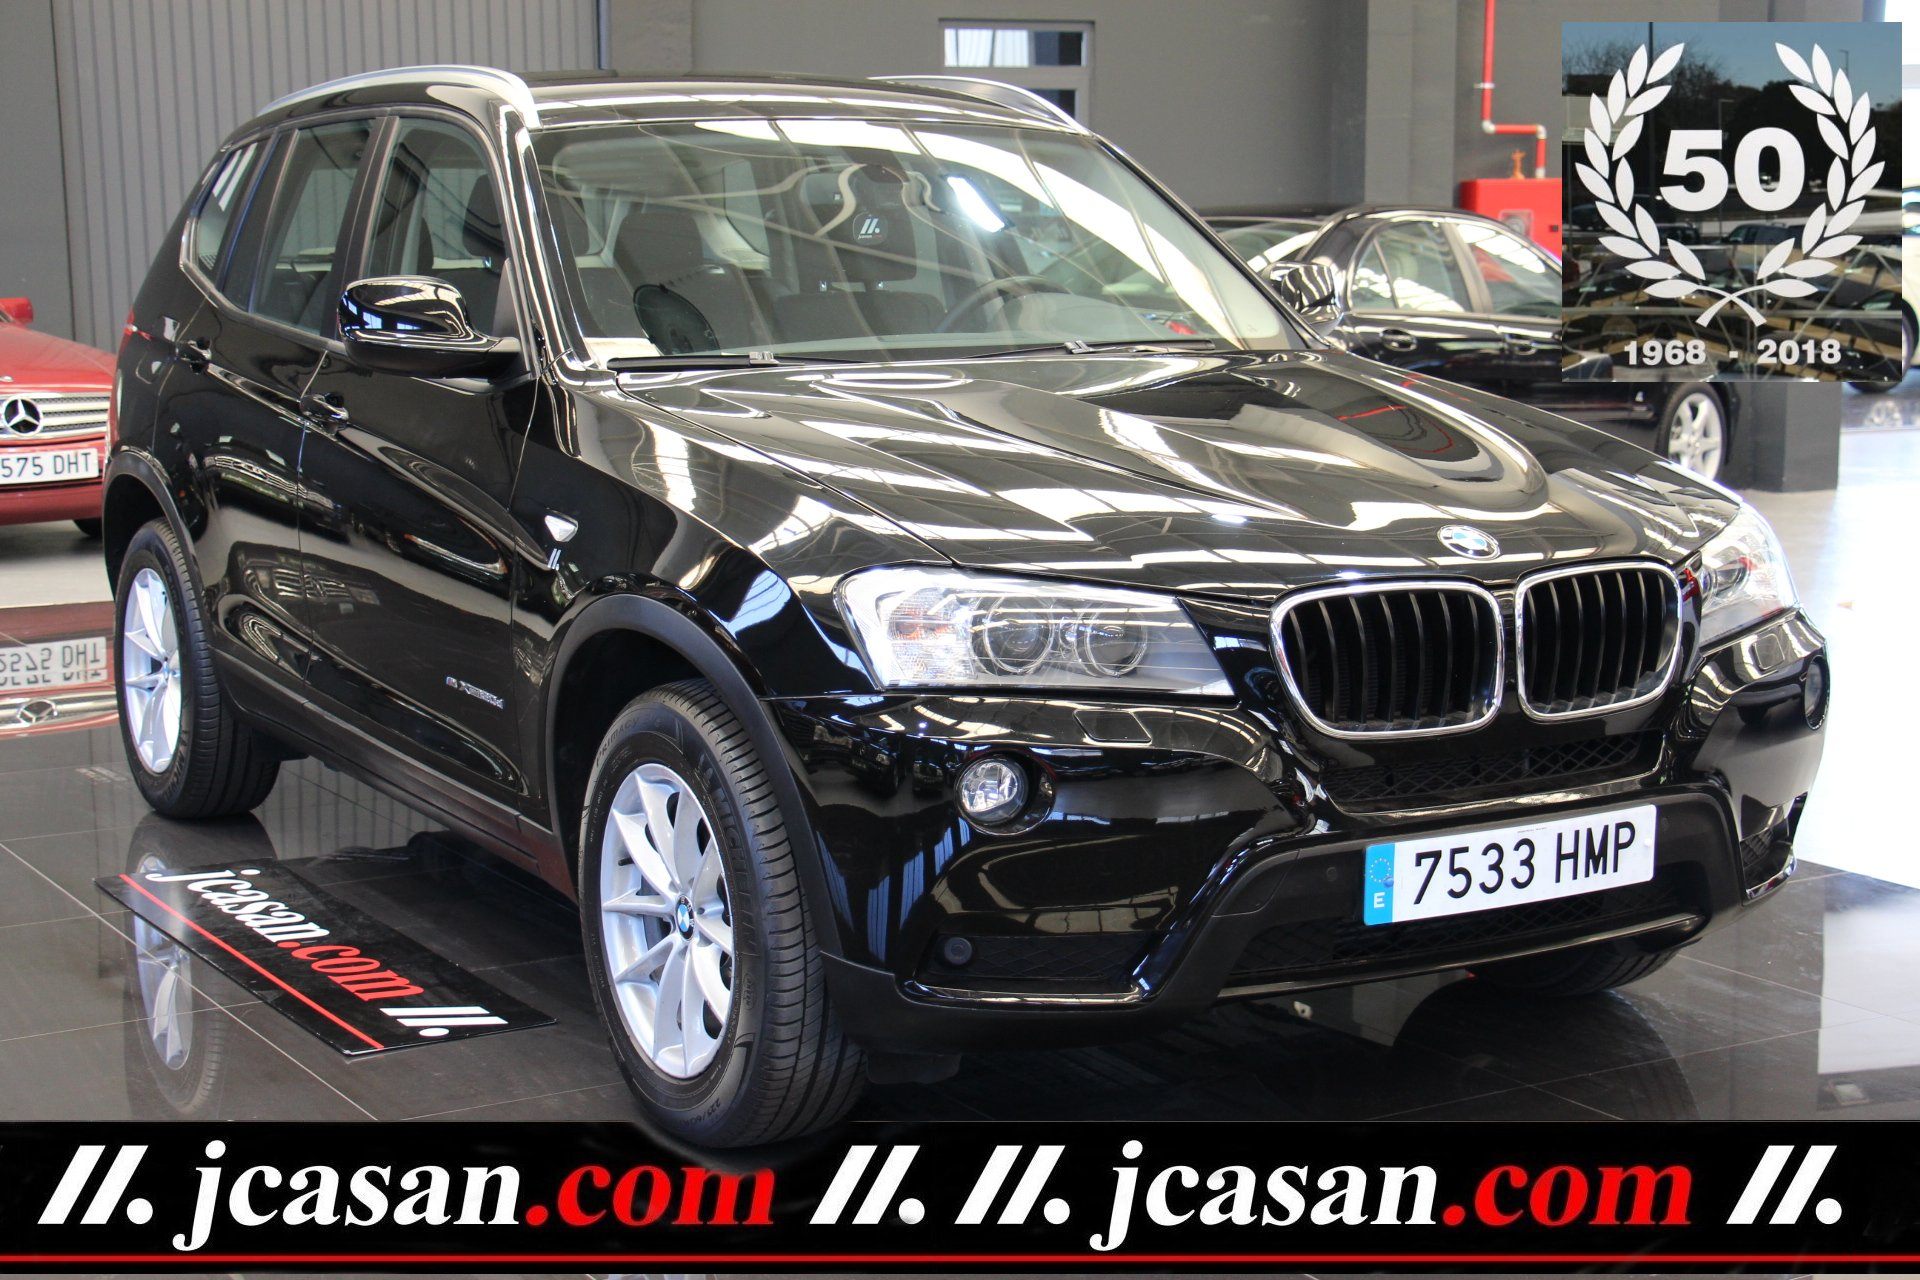 BMW X3 2.0d XDRIVE 4X4 184 CV 6 Vel